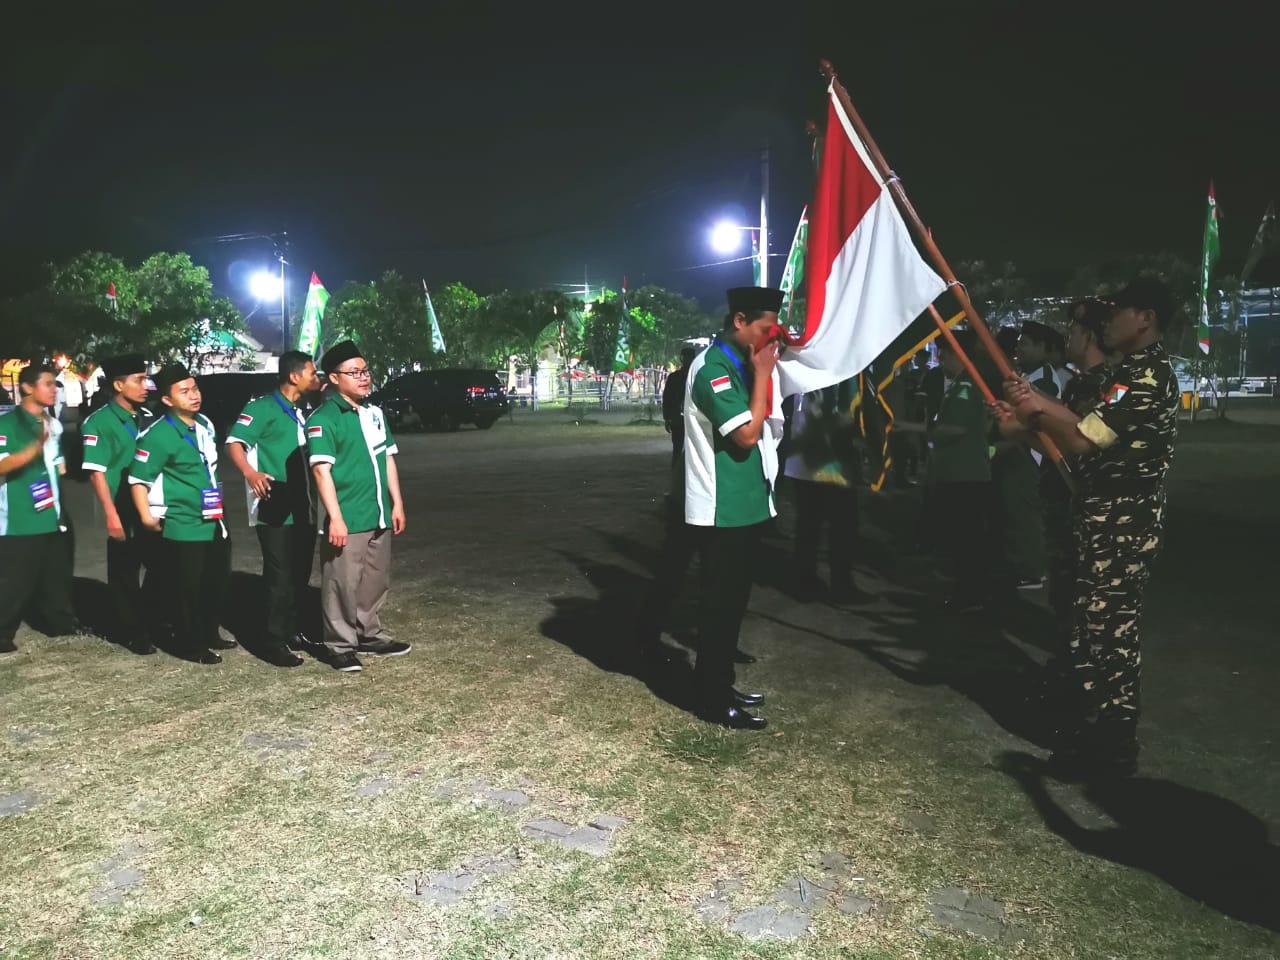 https: img.okezone.com content 2019 09 08 337 2102131 gus-yaqut-yakin-masa-depan-indonesia-akan-jaya-dGgl1FOpg6.jpg